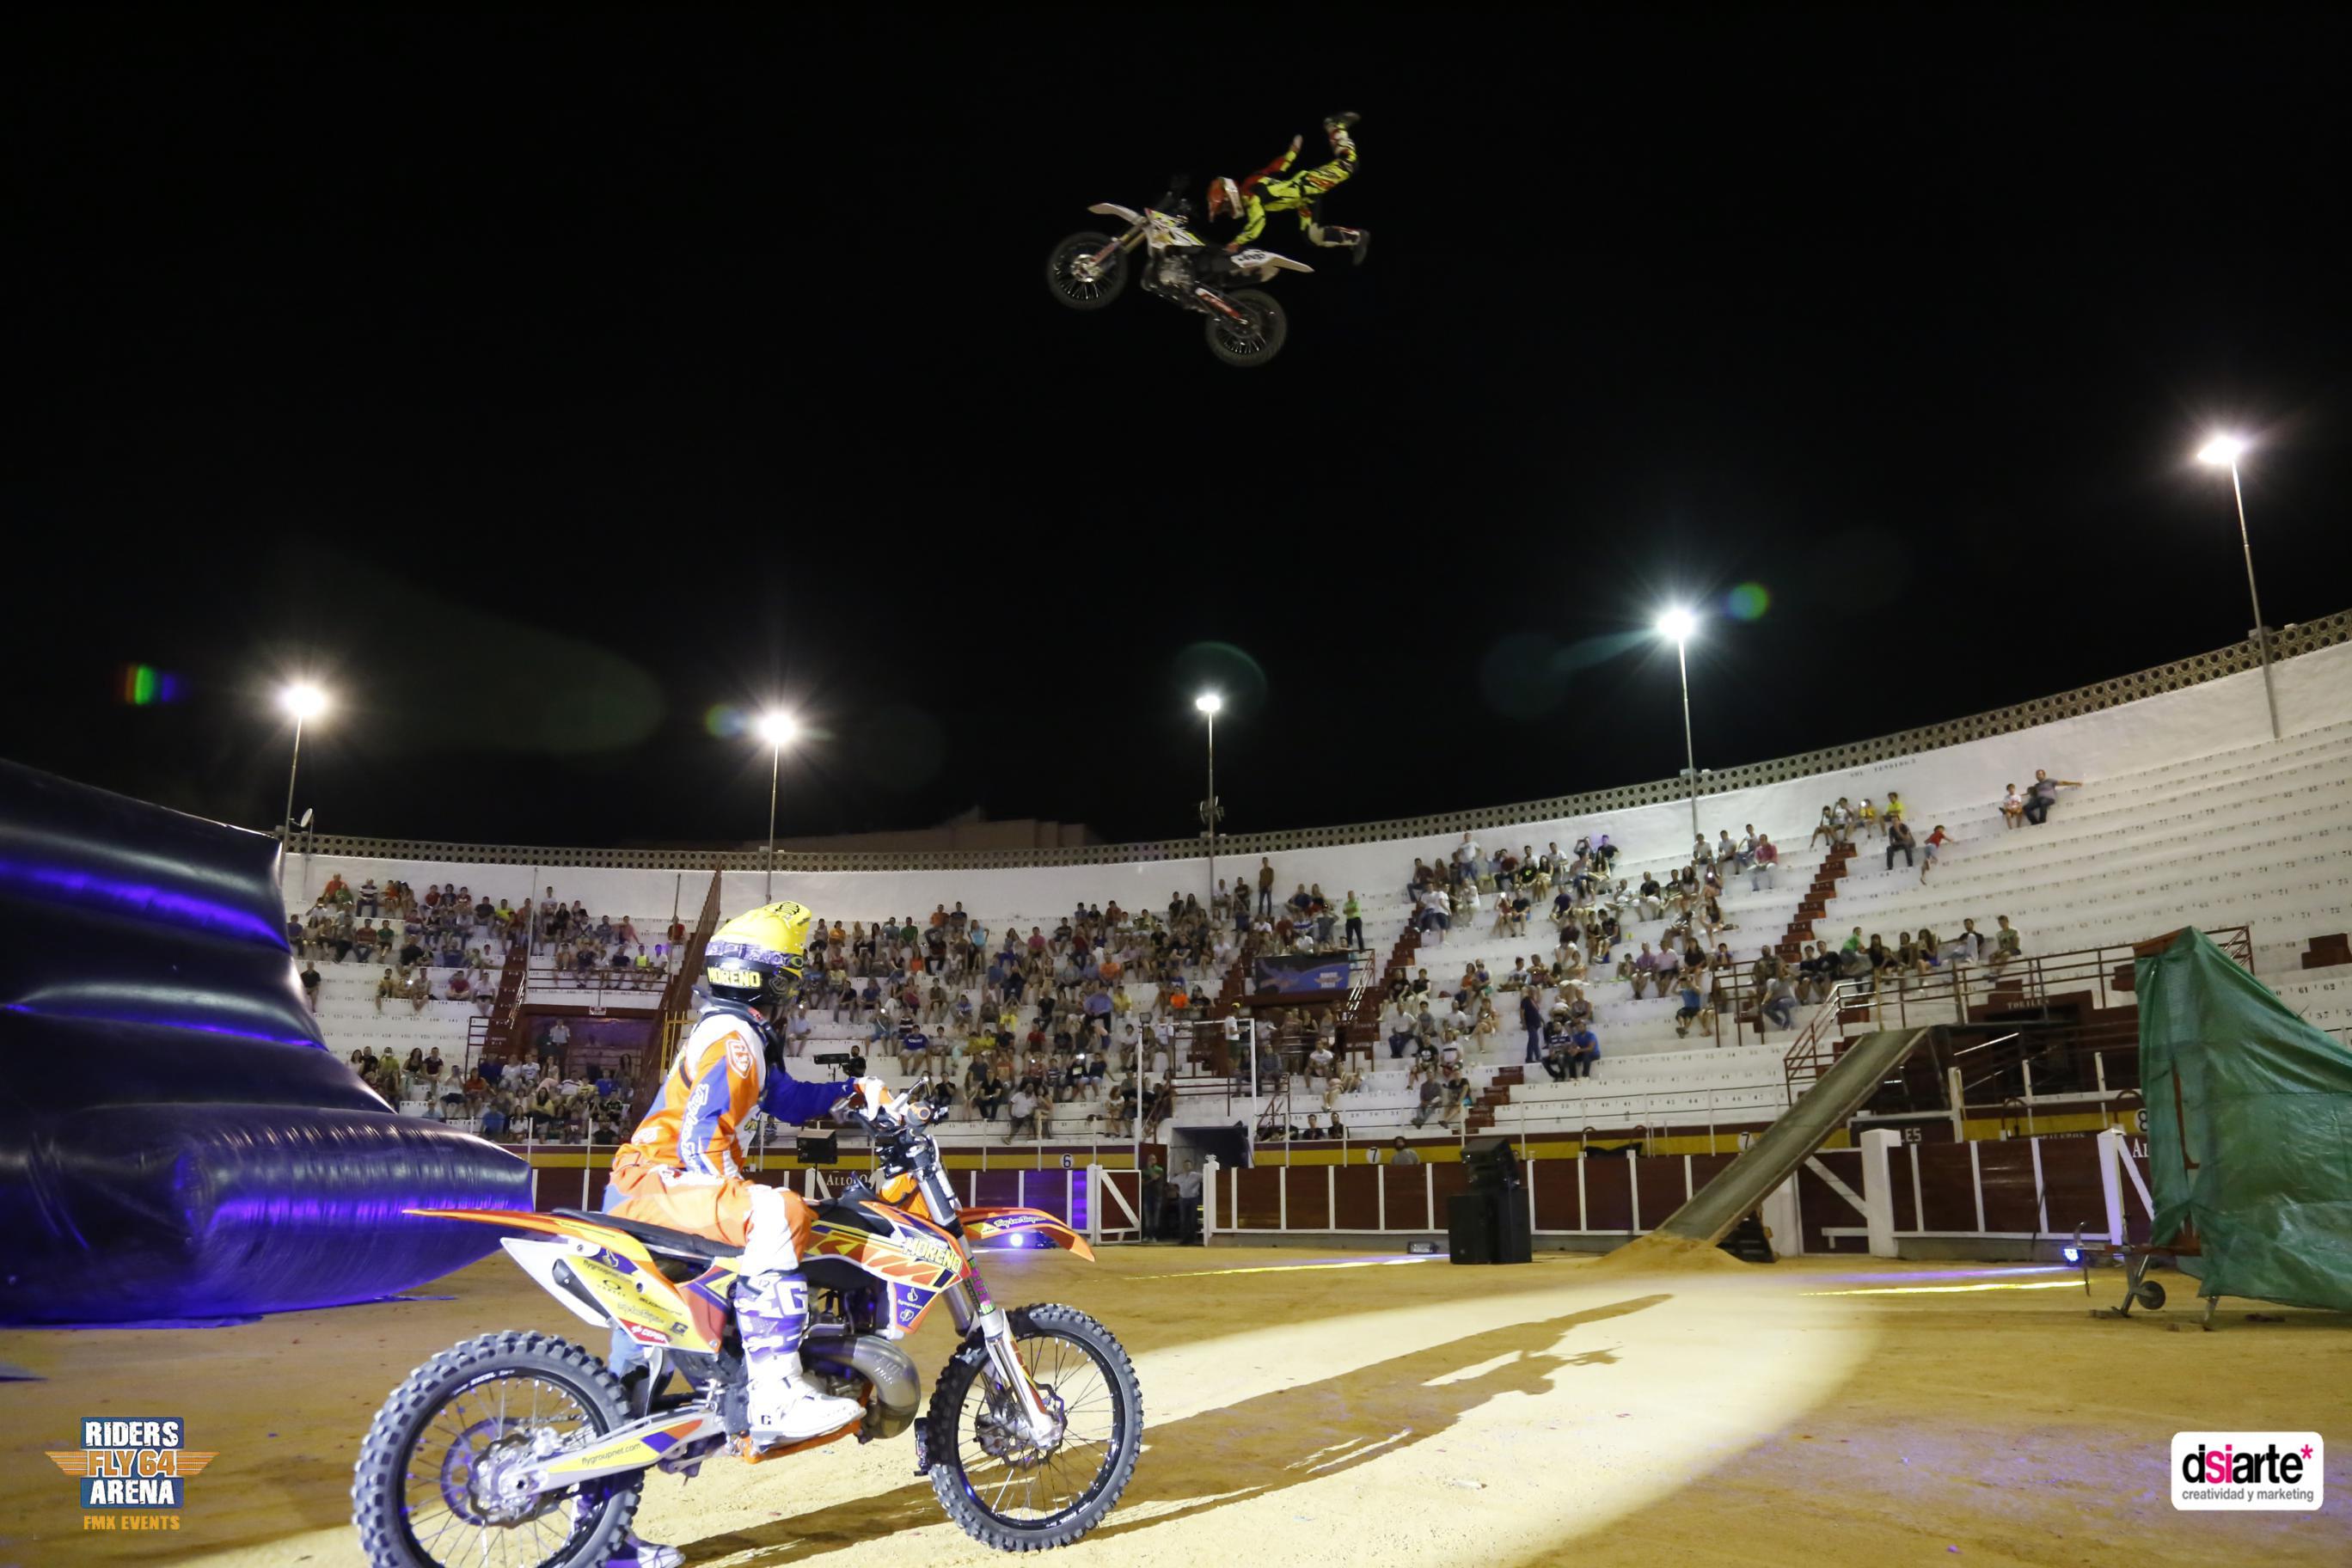 Fotografía espectáculos Albacete, fotografia de motos, Summer Night Tour 2015, freestyle motocross cup 2015